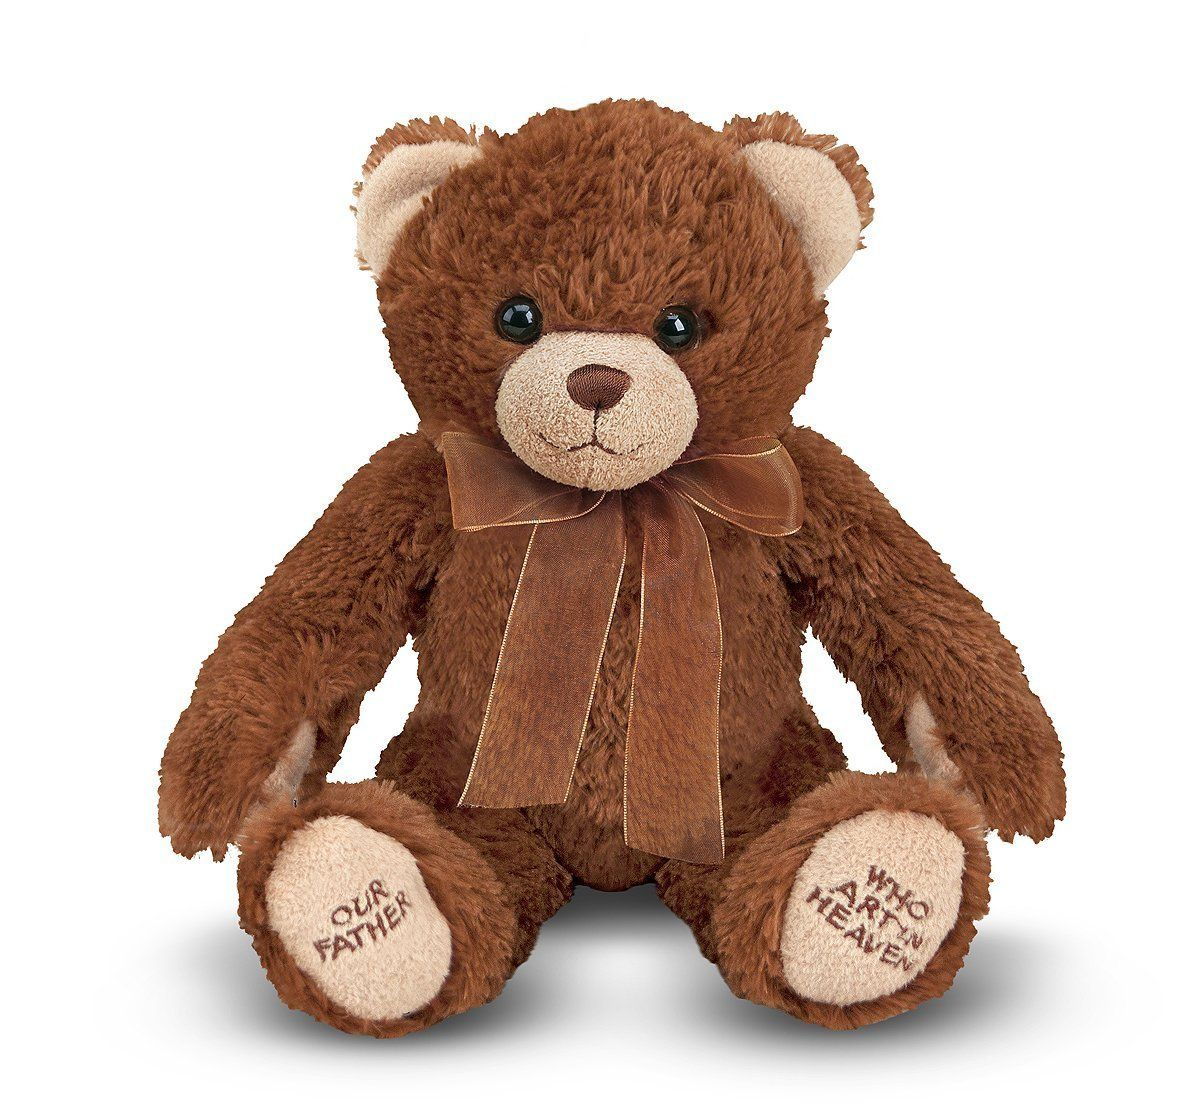 Melissa & Doug Lord's Prayer Bear Stuffed Animal With